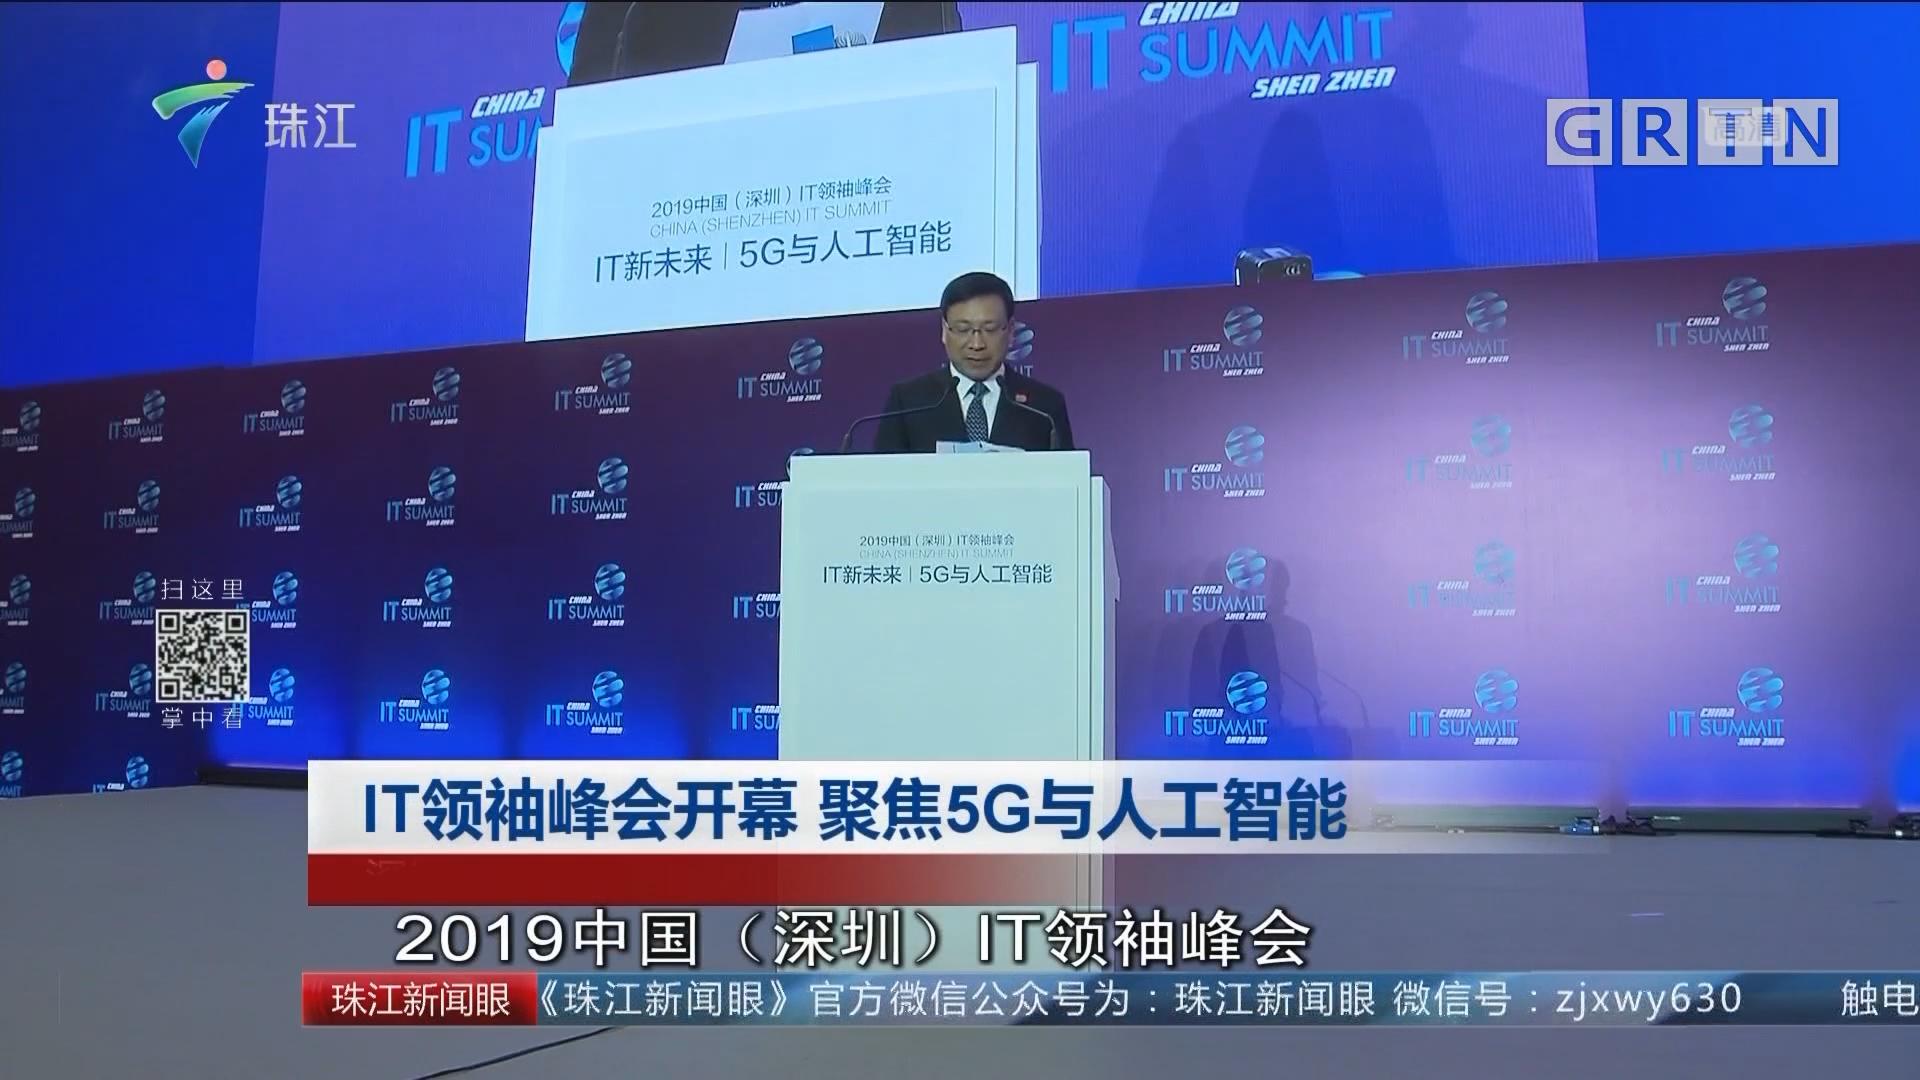 IT领袖峰会开幕 聚焦5G与人工智能